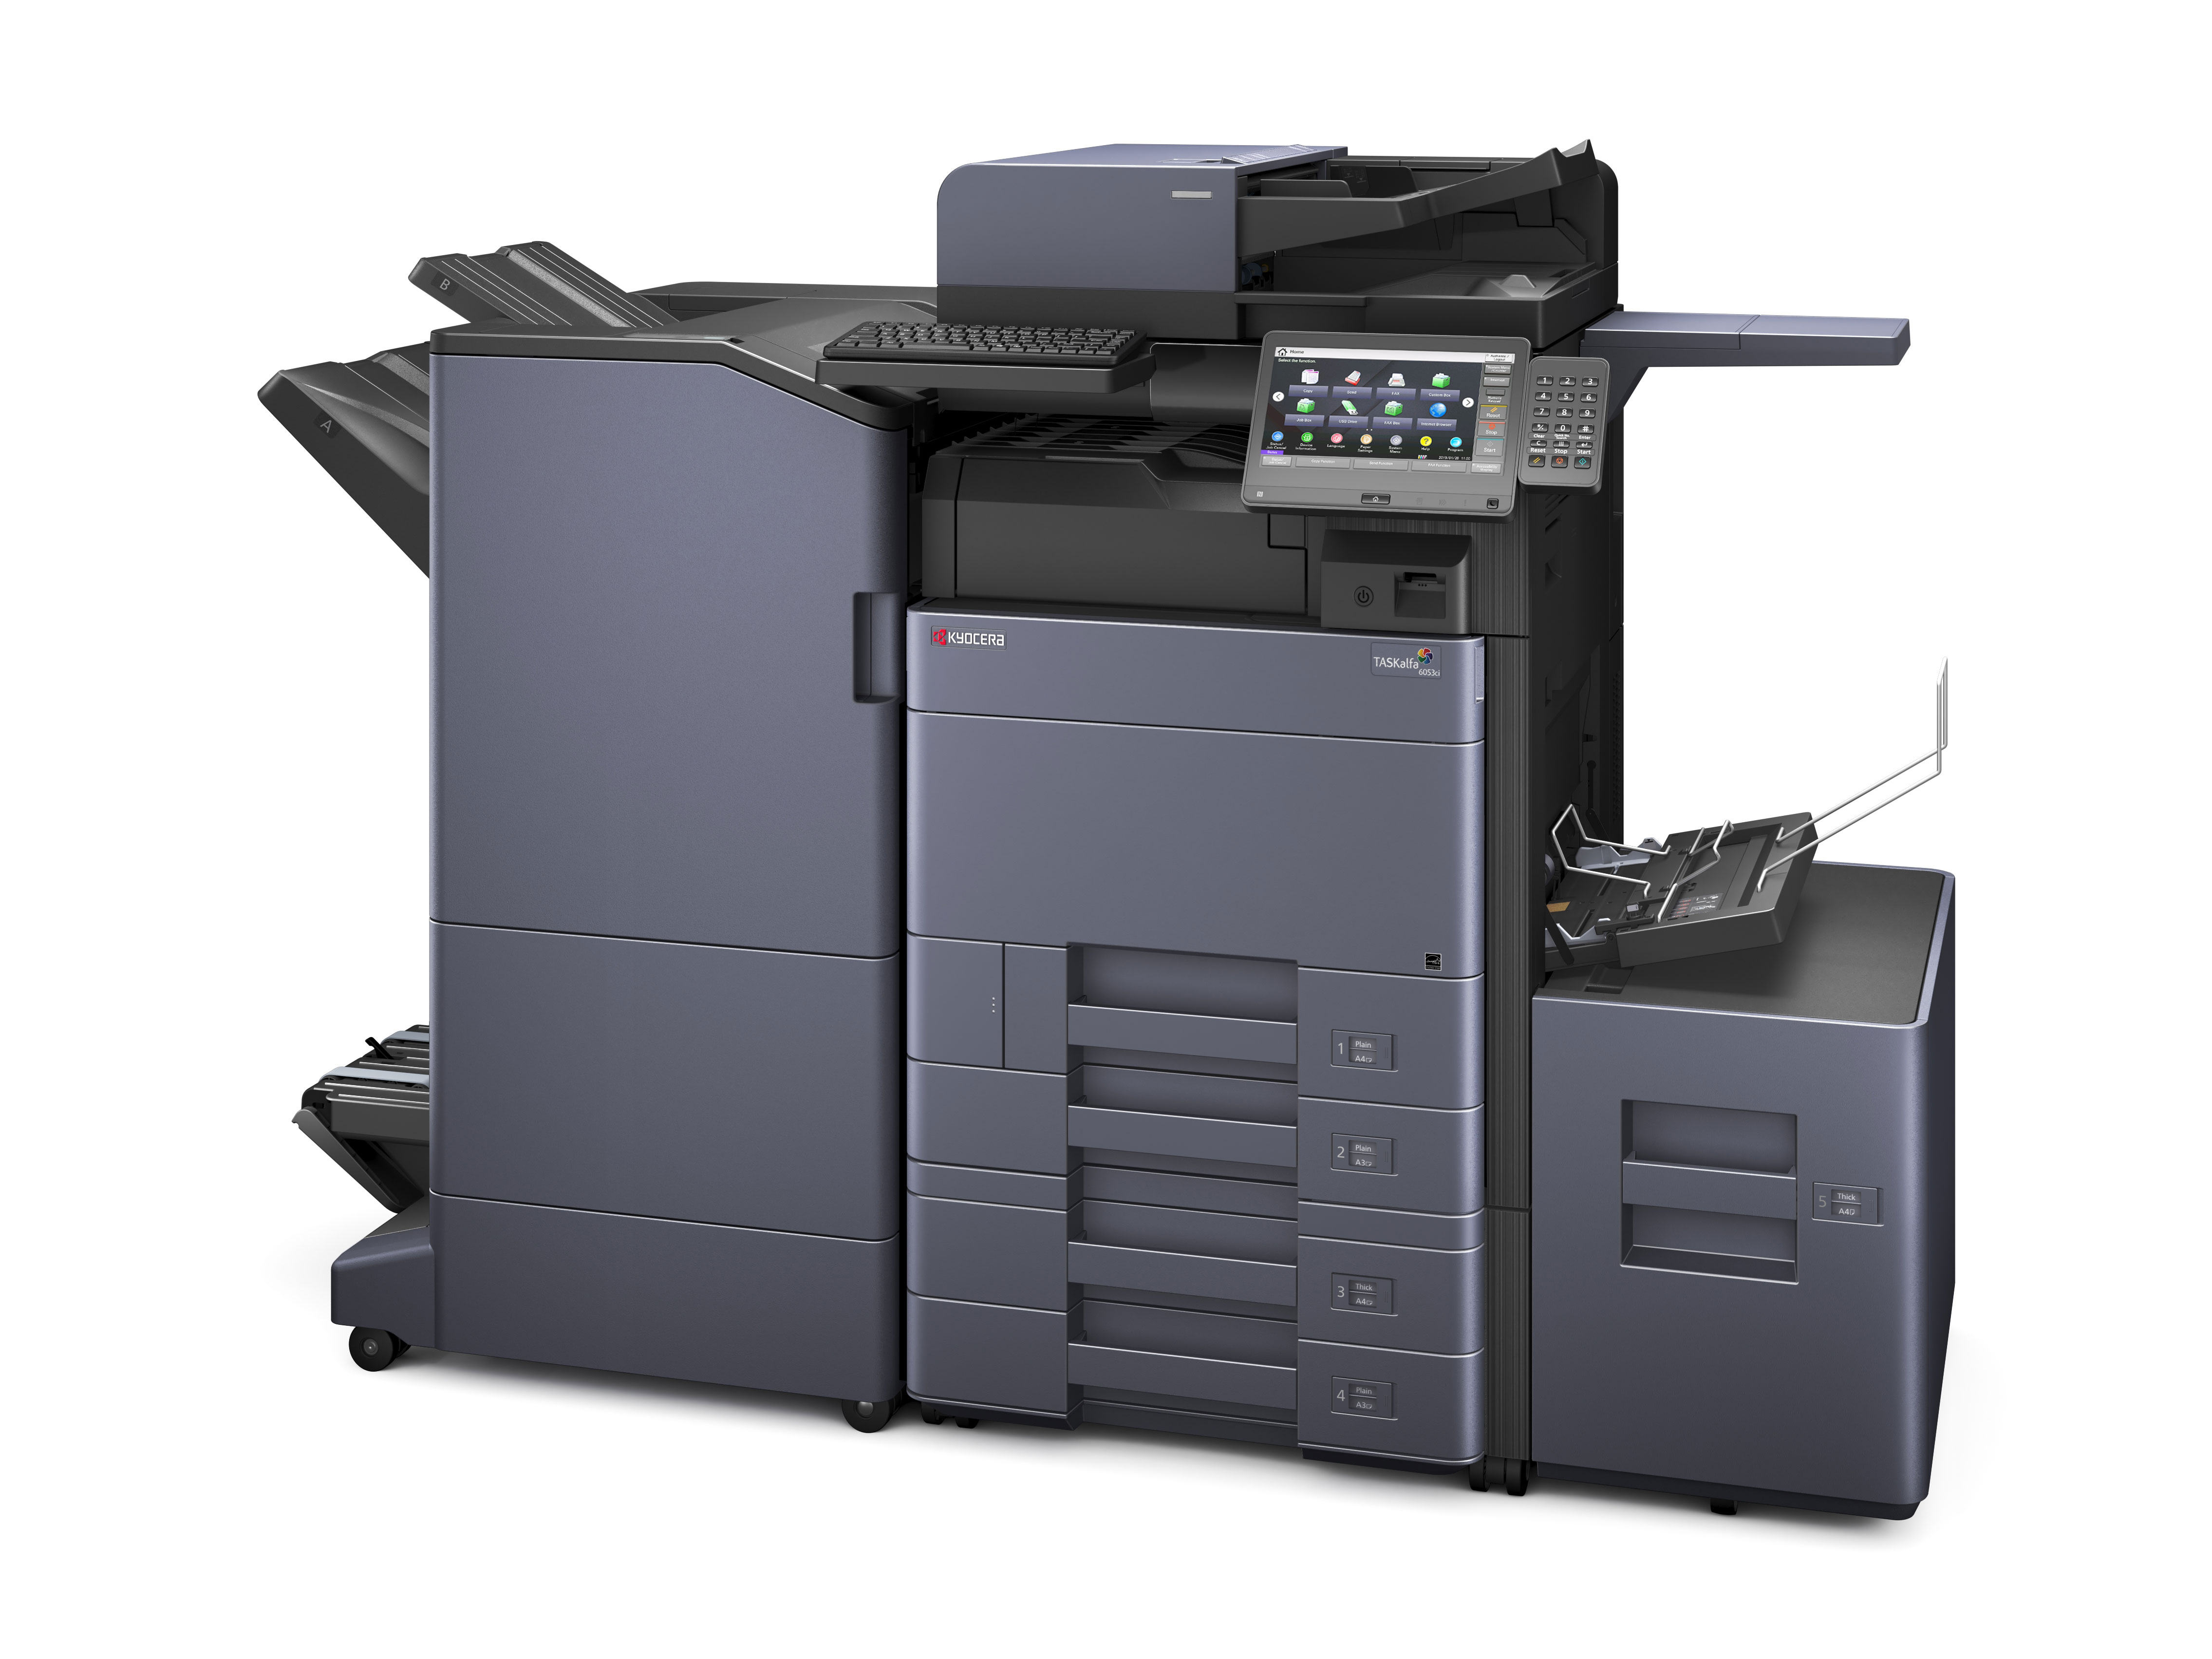 Fotocopiadora Kyocera TASKalfa 6053ci Barata